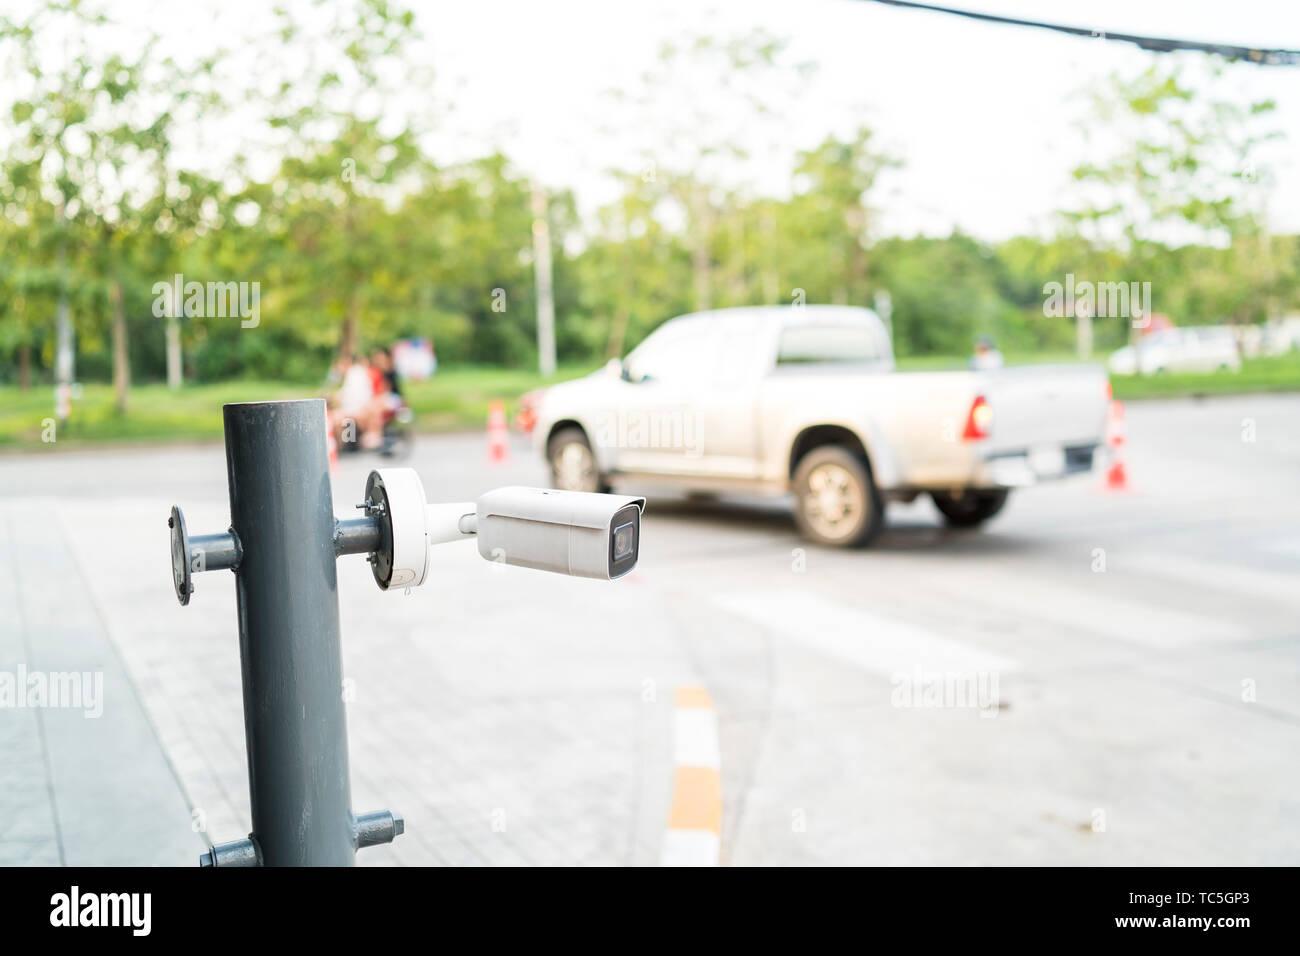 surveillance camera at entrance department store - Stock Image